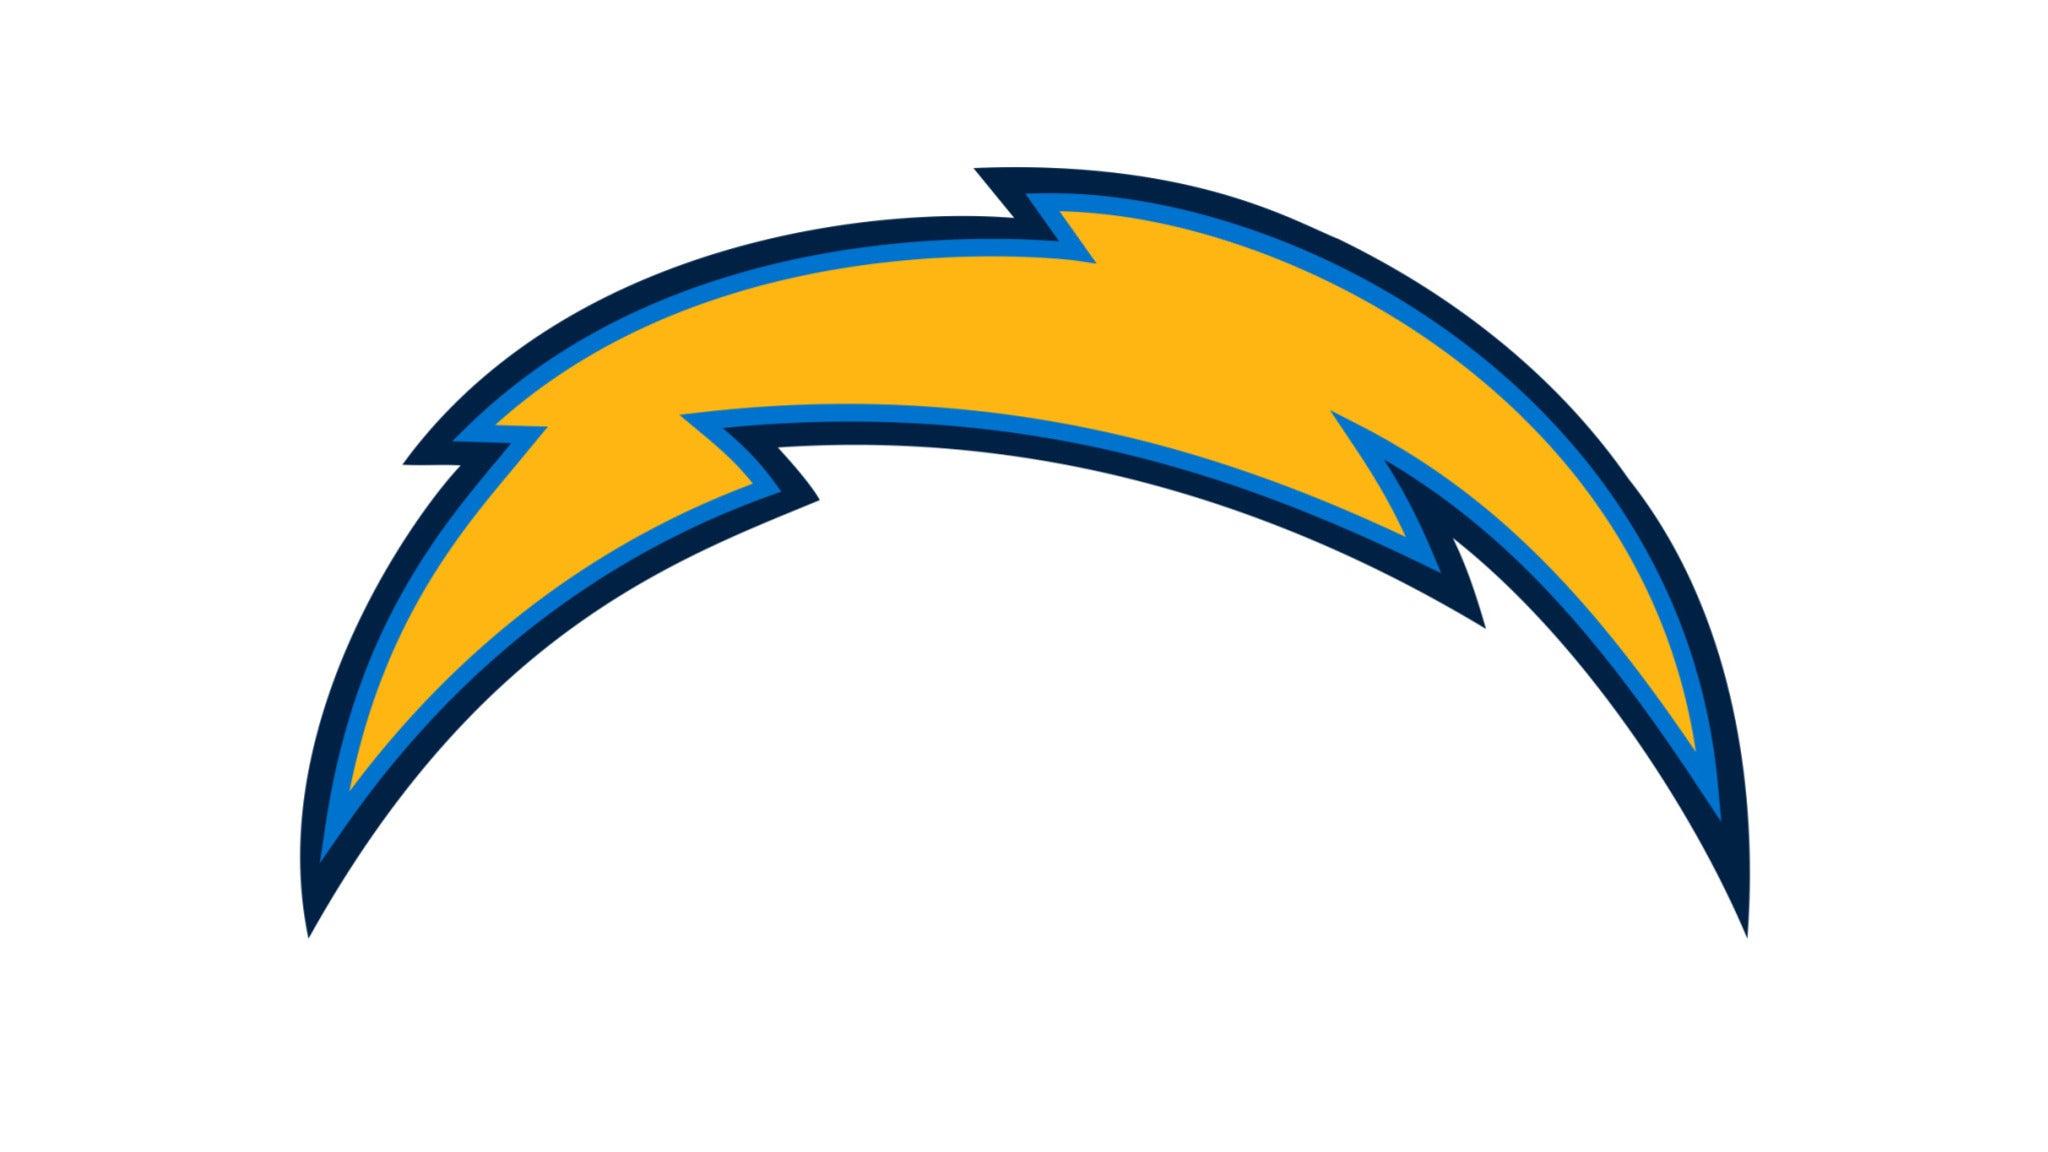 San Diego Chargers vs. Oakland Raiders - San Diego, CA 92160